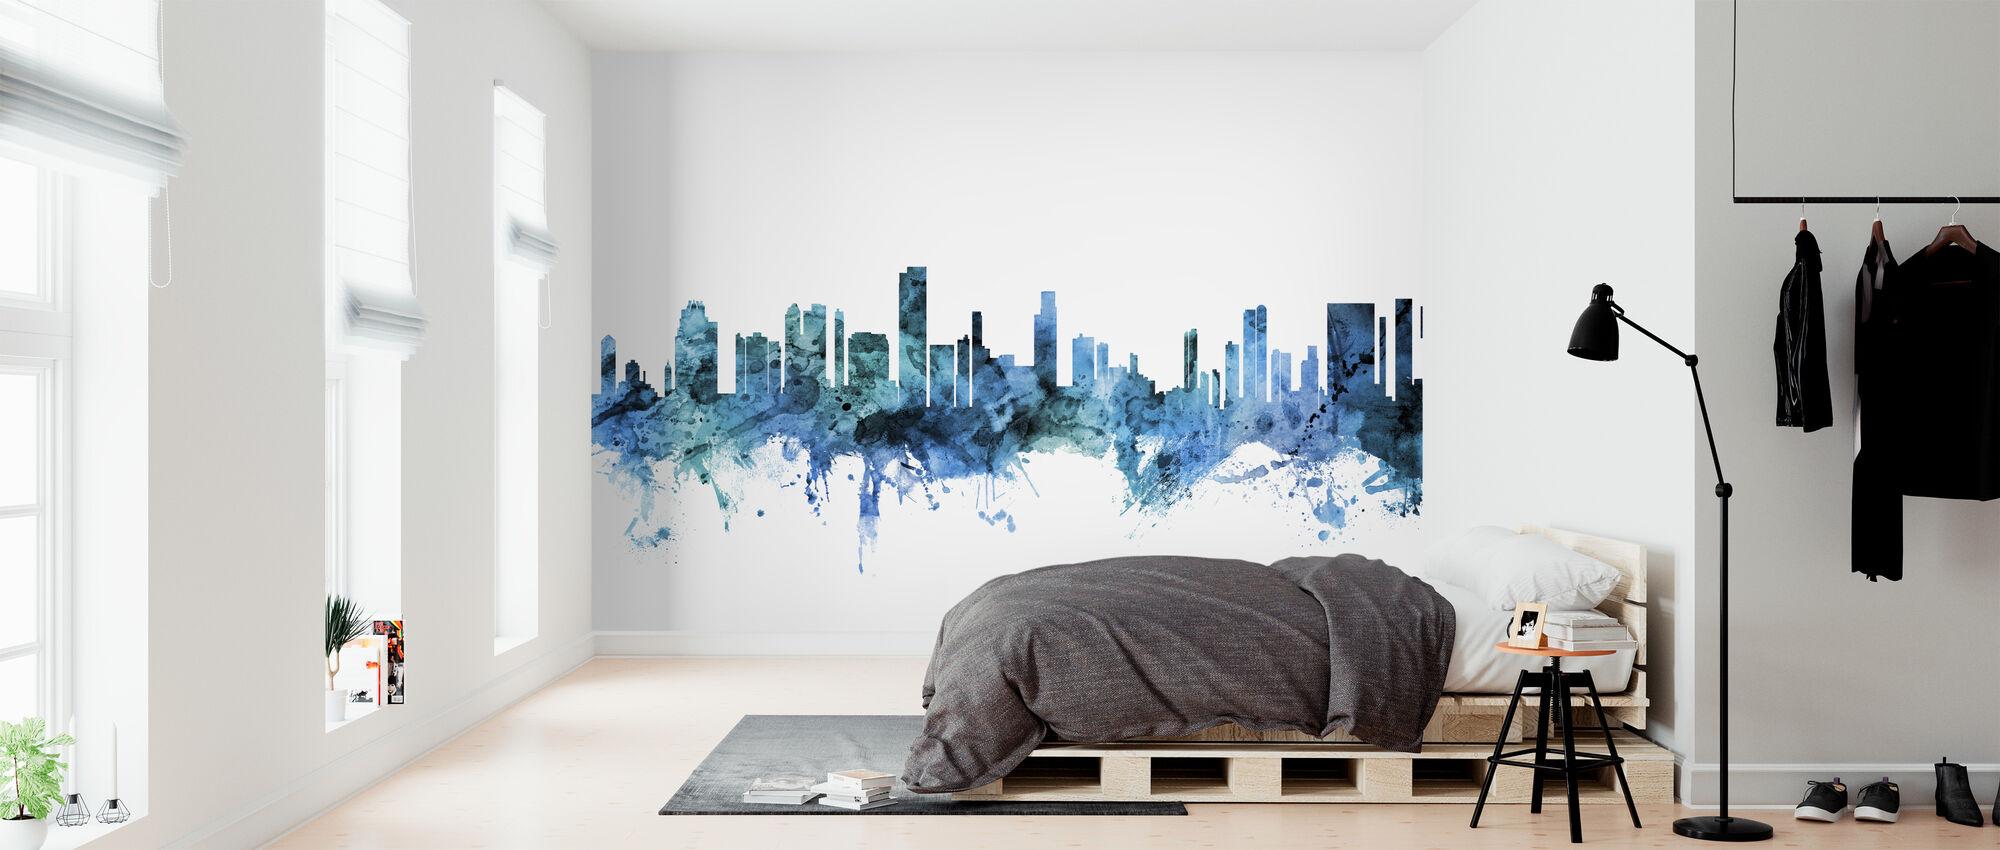 Honolulu Hawaii Skyline - Wallpaper - Bedroom